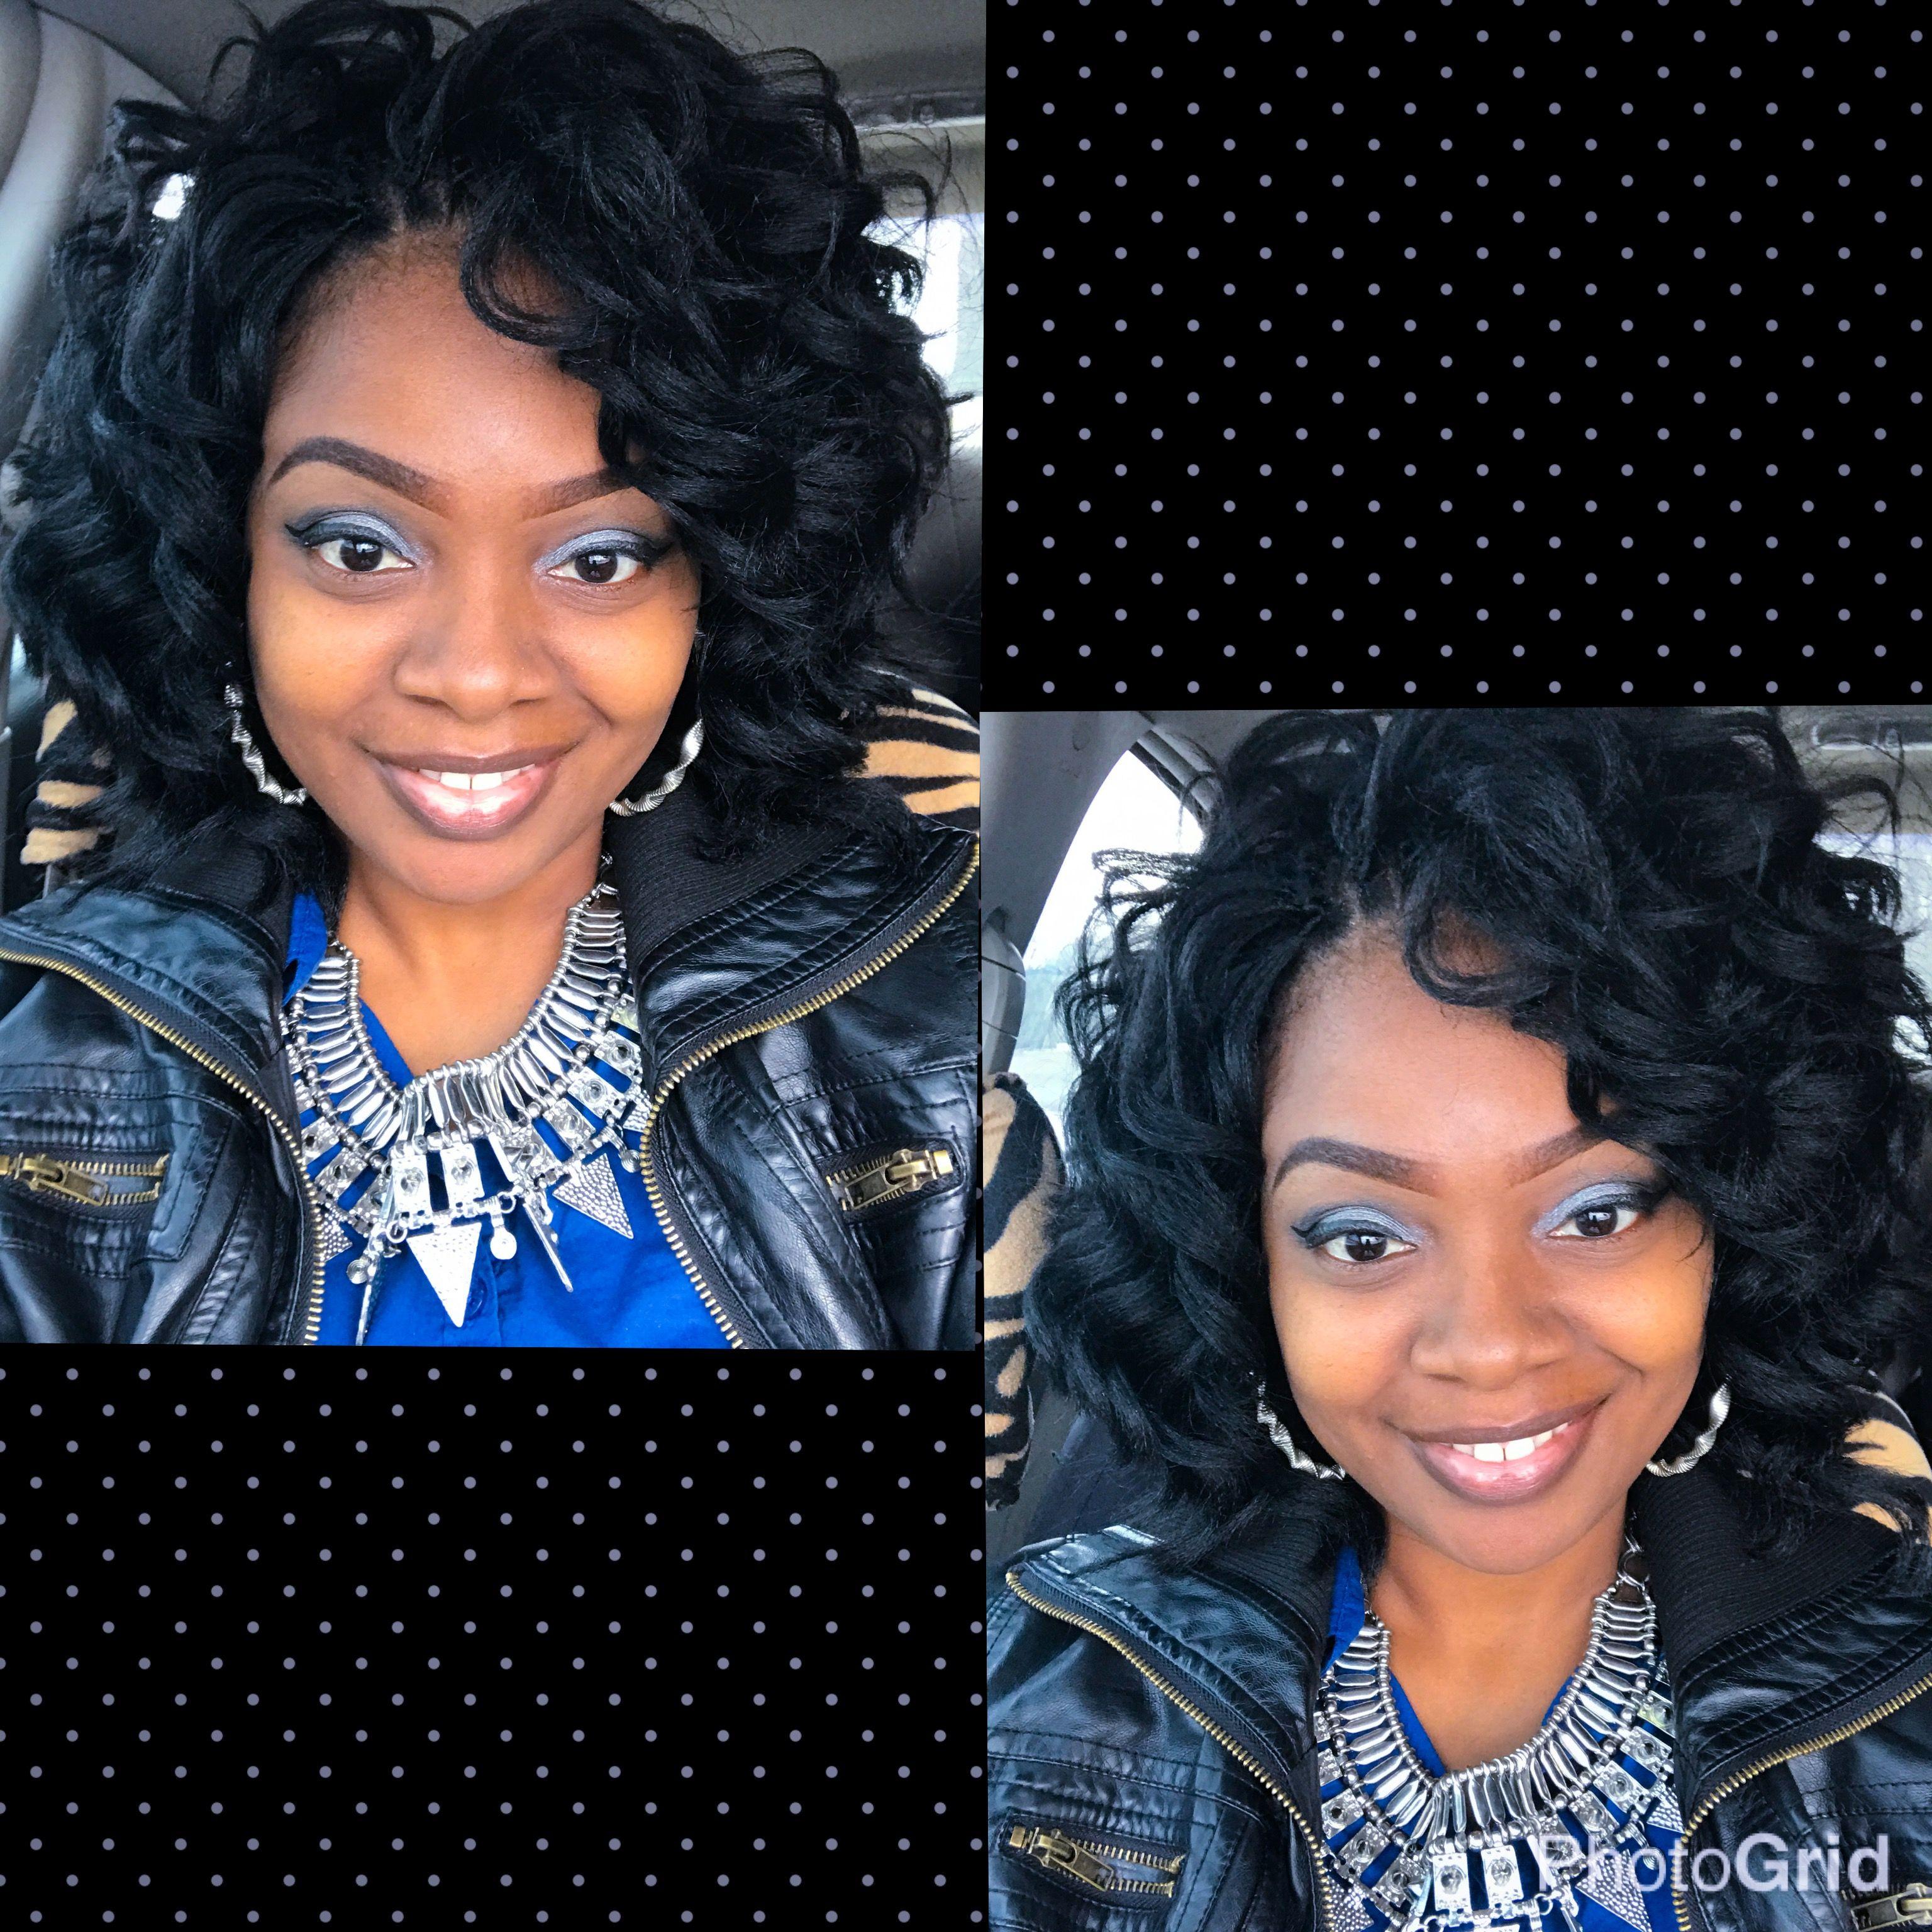 Kima Ocean Wave Crochet Braids Crochet Hair Styles African Braids Hairstyles Crochet Braids Hairstyles